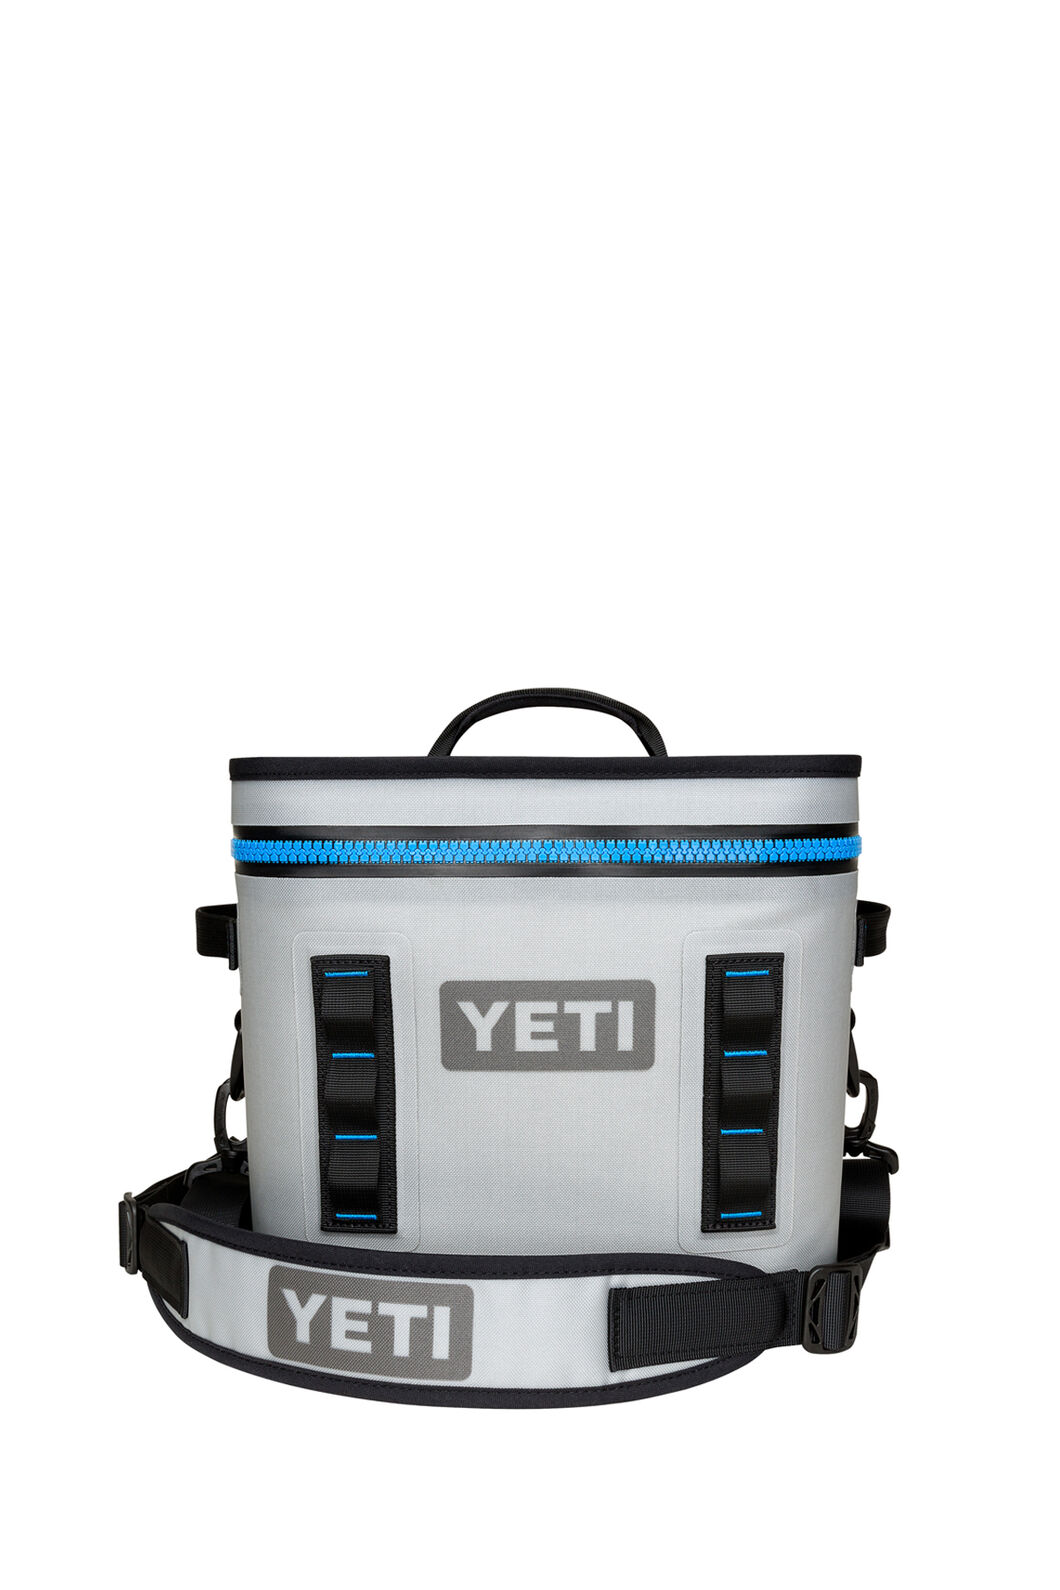 Yeti Hopper Flip Soft Cooler, Grey, hi-res